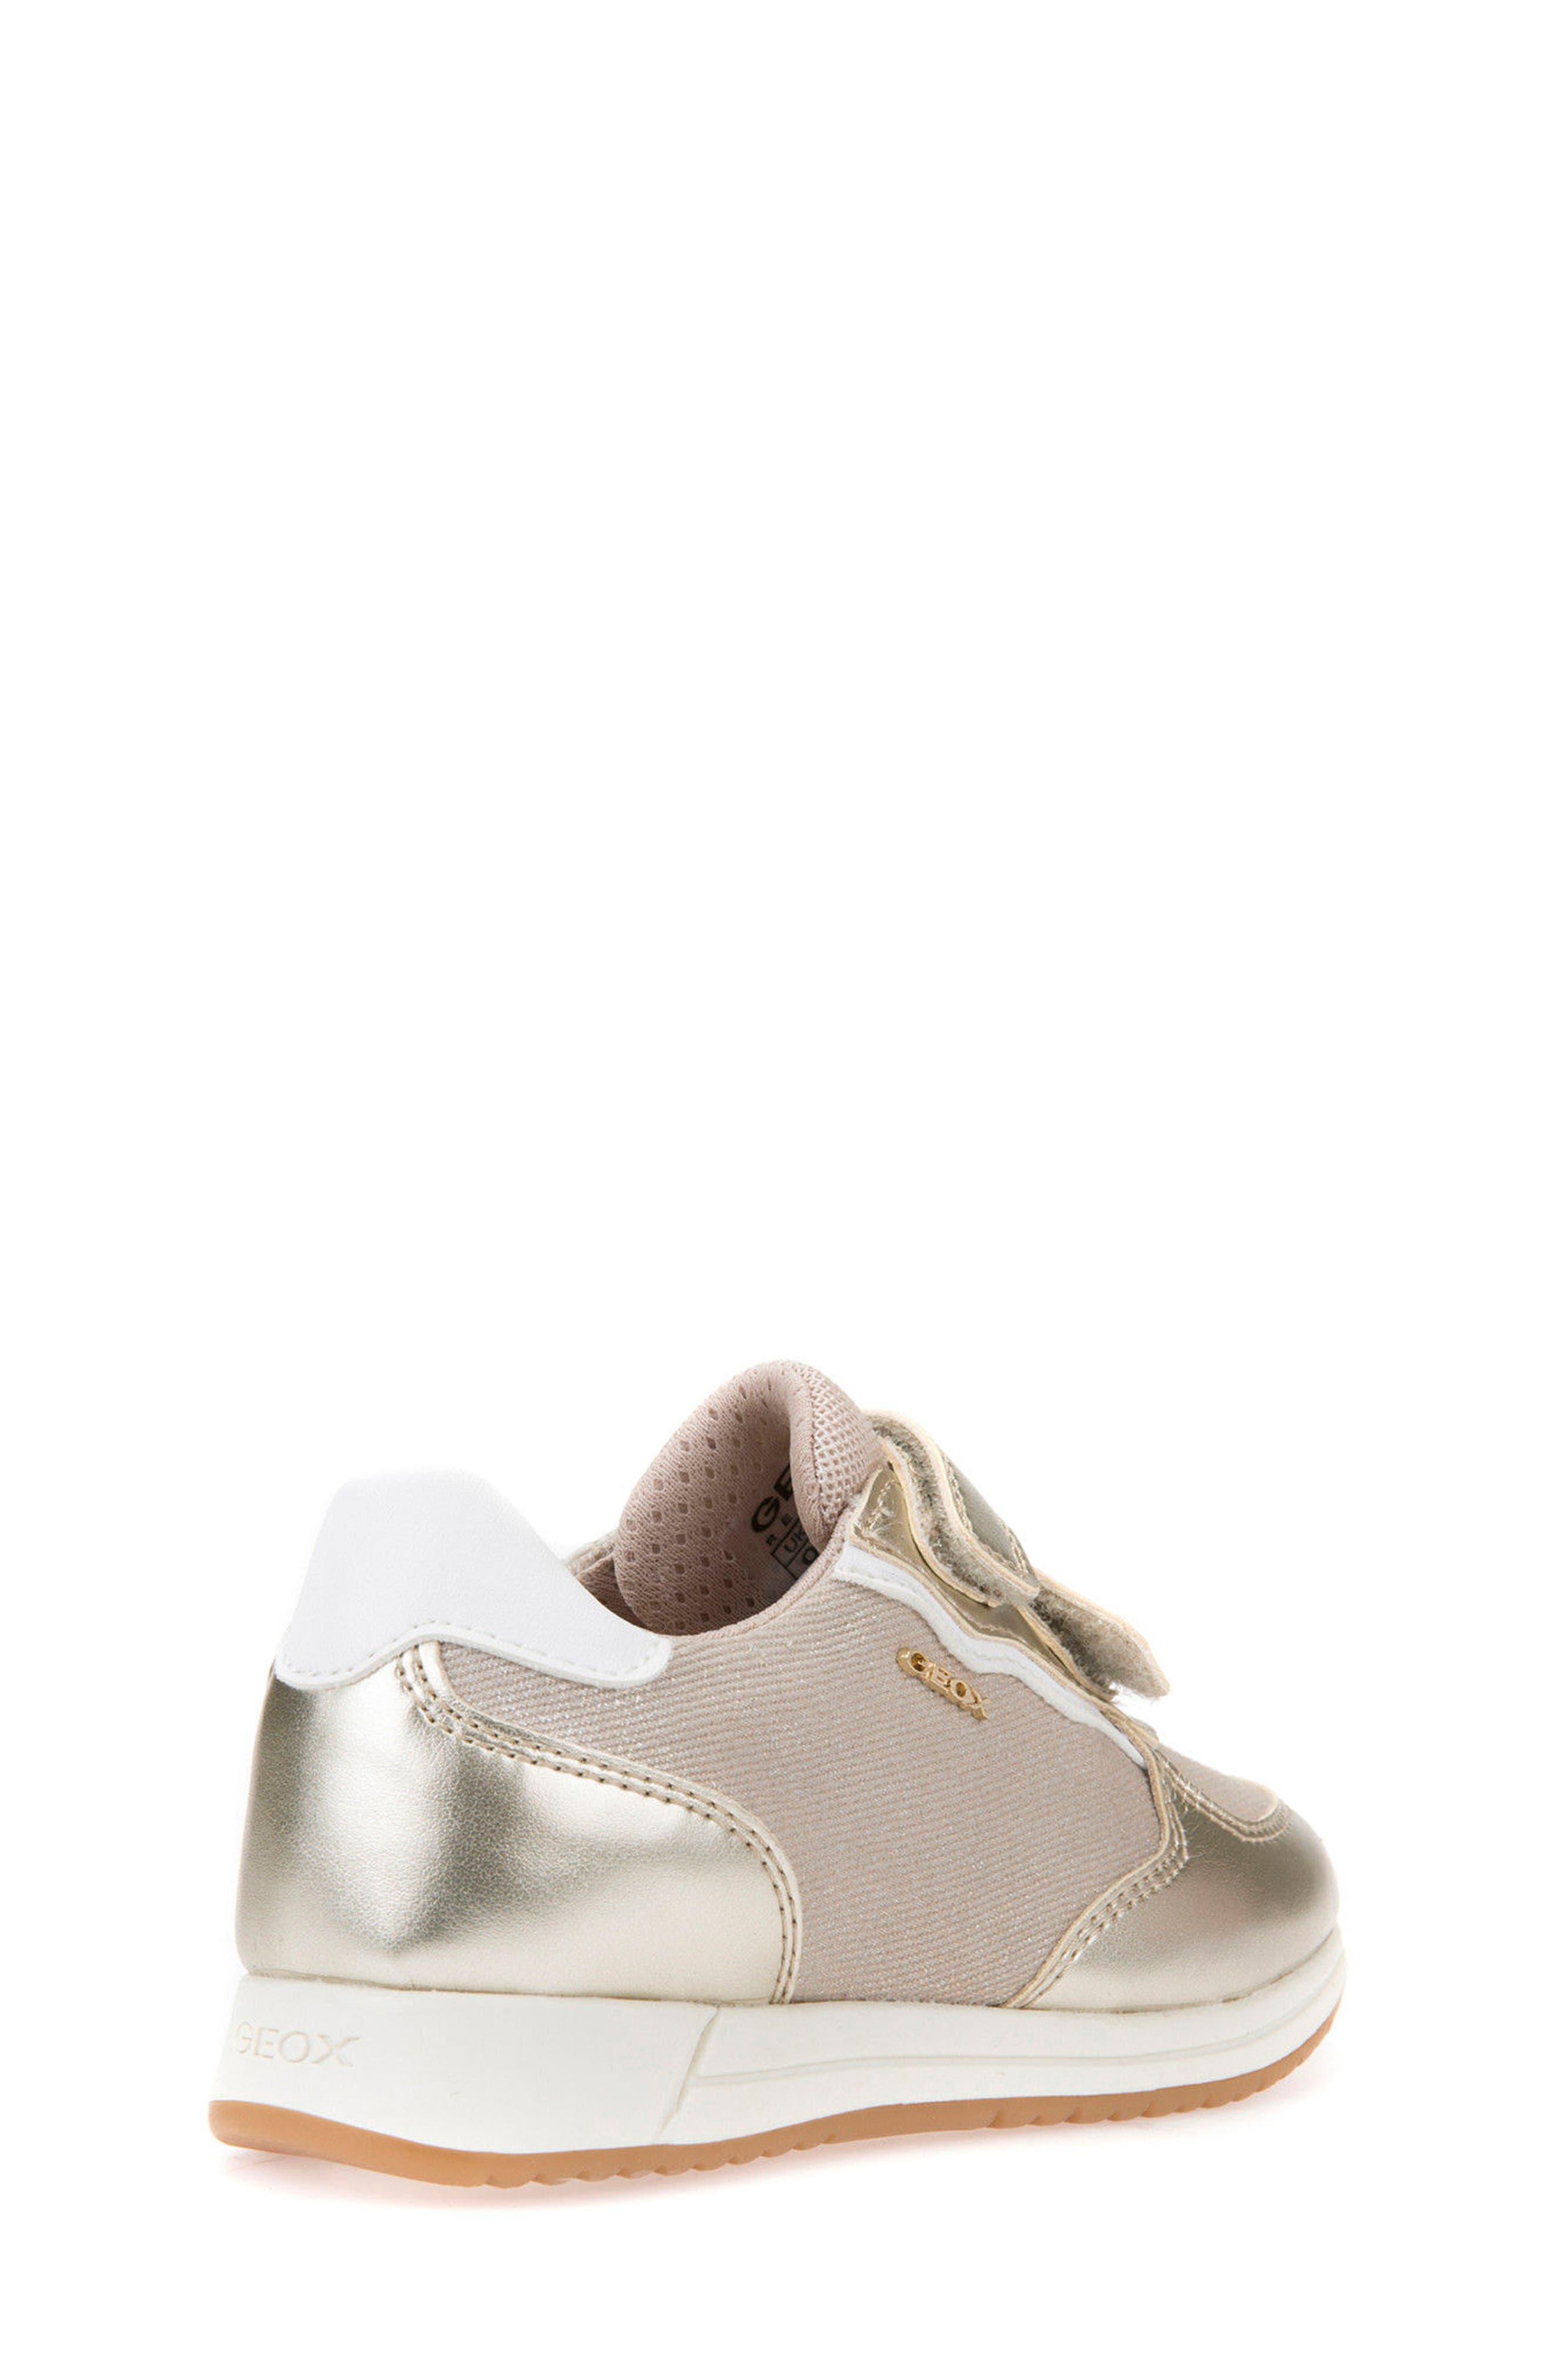 Jensea Metallic Accent Sneaker,                             Alternate thumbnail 2, color,                             BEIGE/ LIGHT GOLD